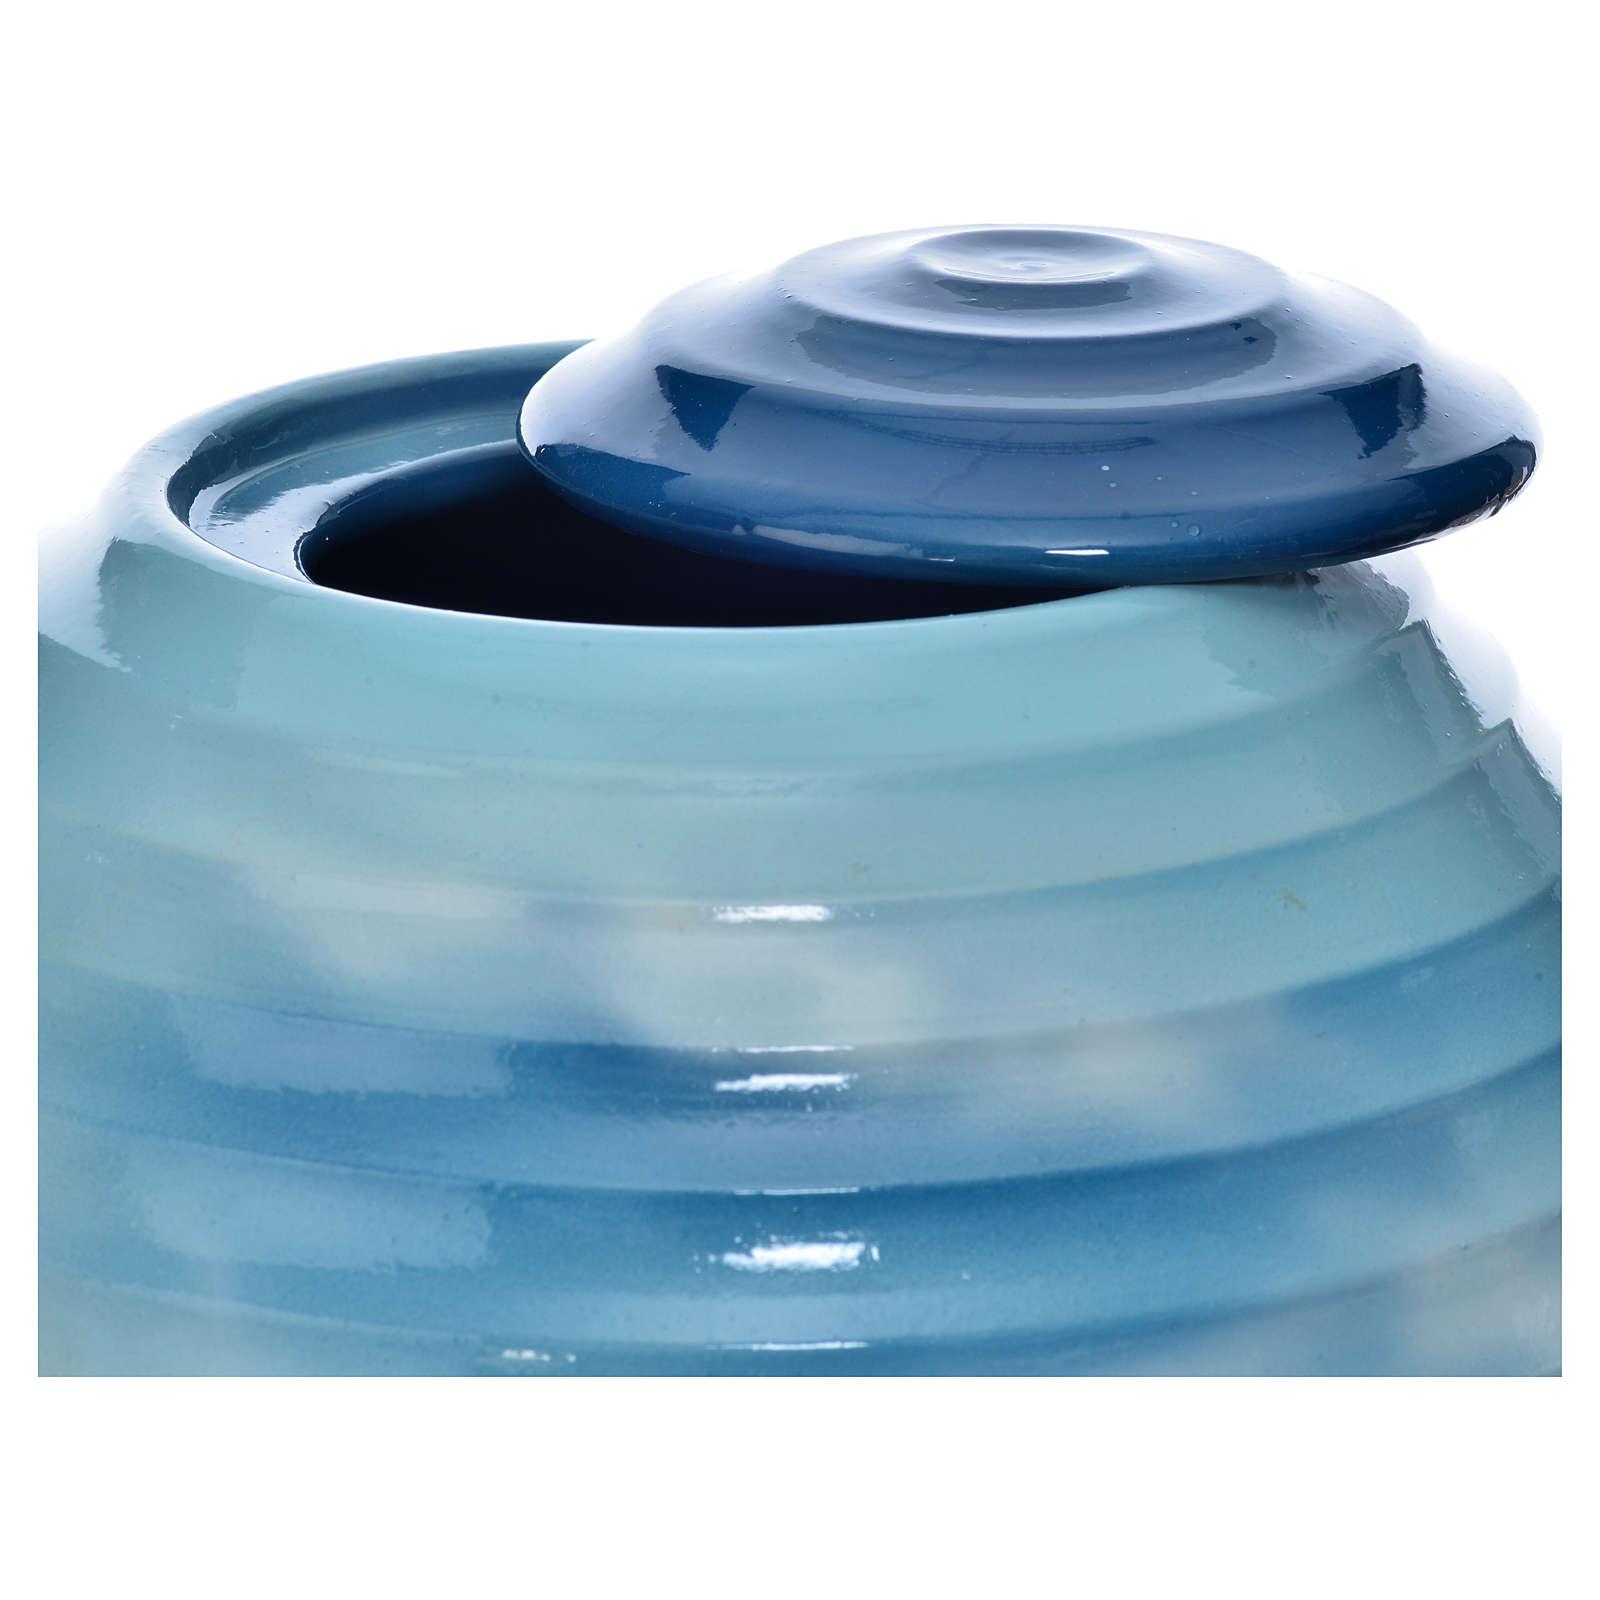 Urna cineraria porcellana dipinta a mano azzurro fantasia 3